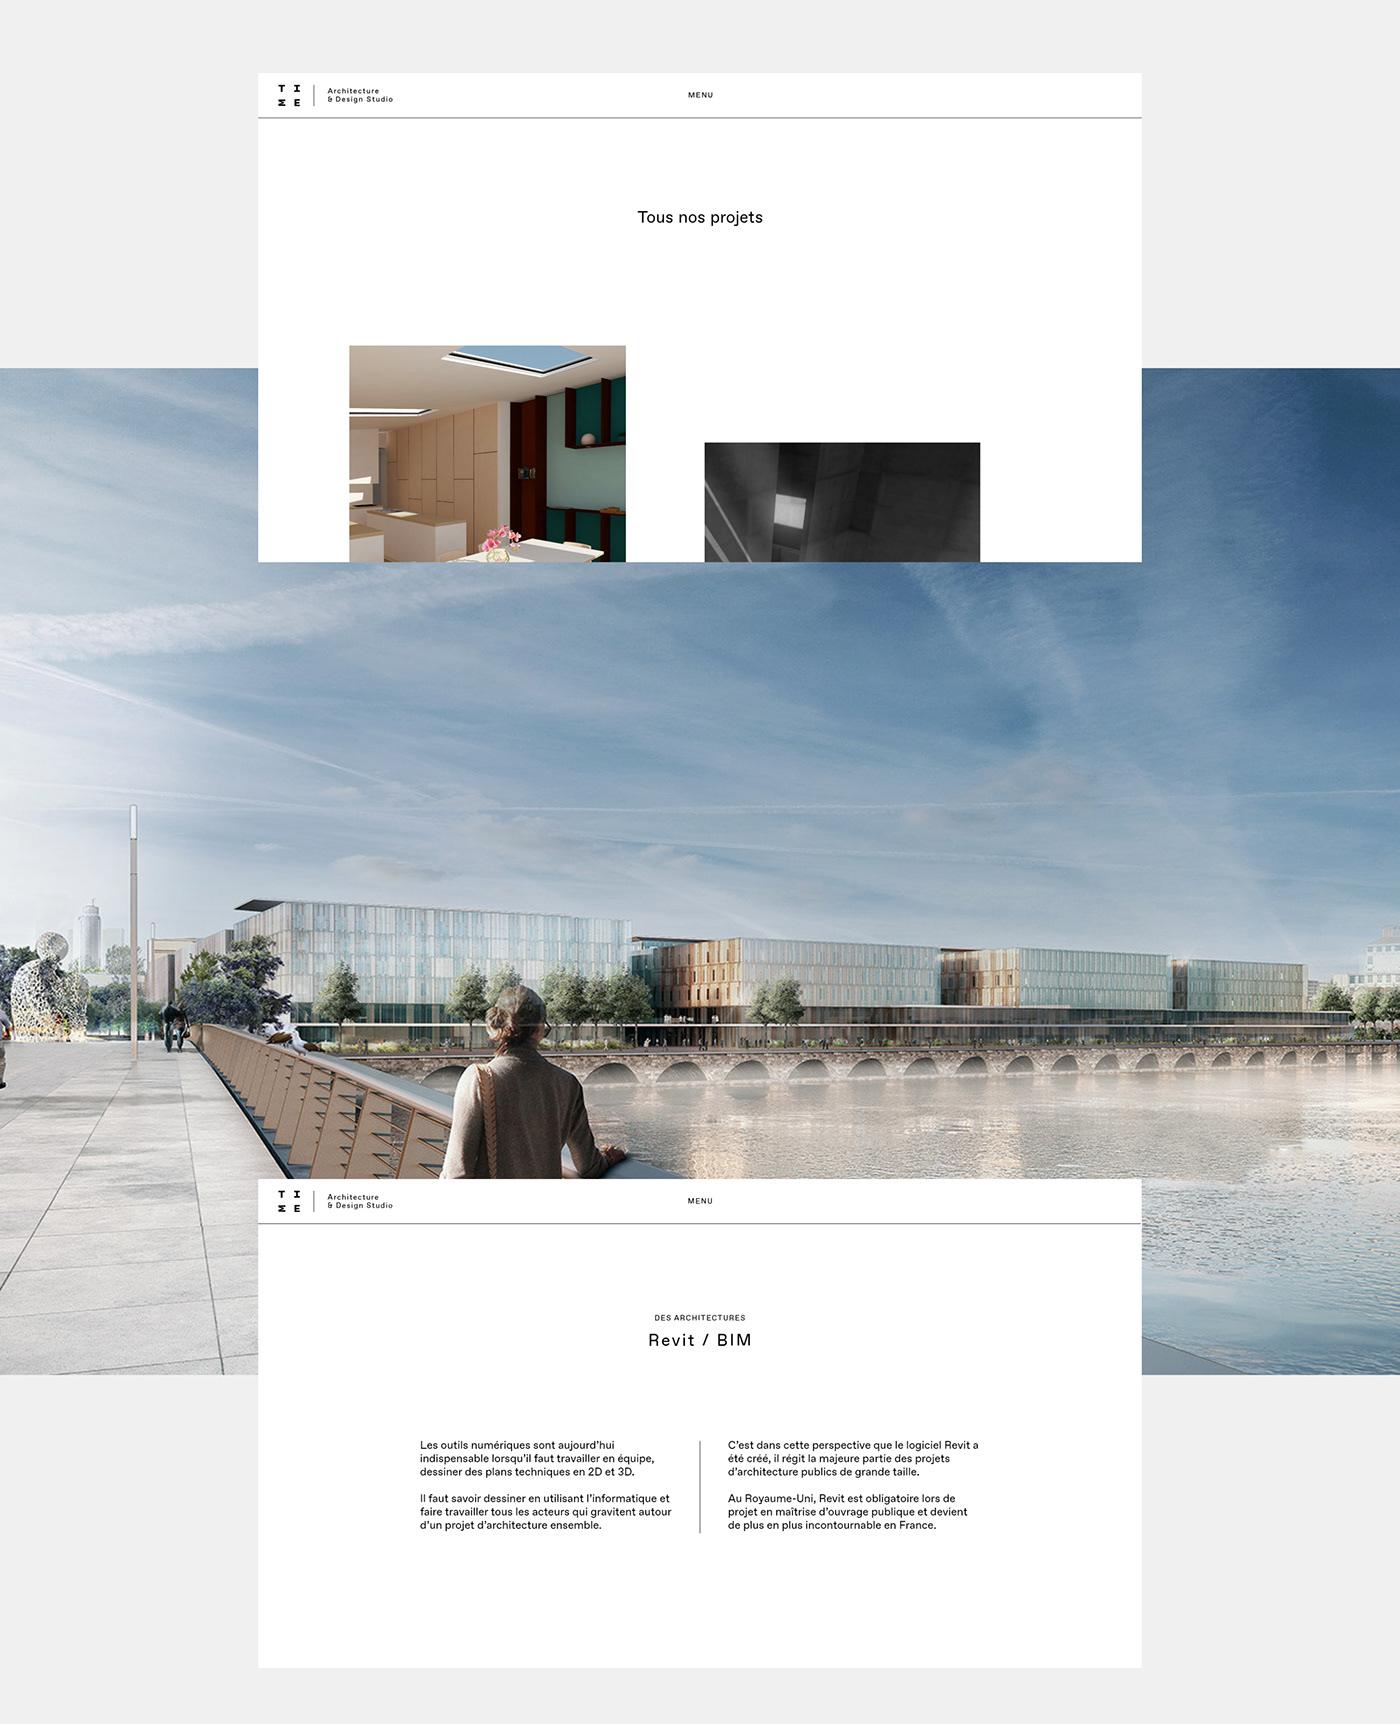 ui design interaction digital design Adobe XD prototype